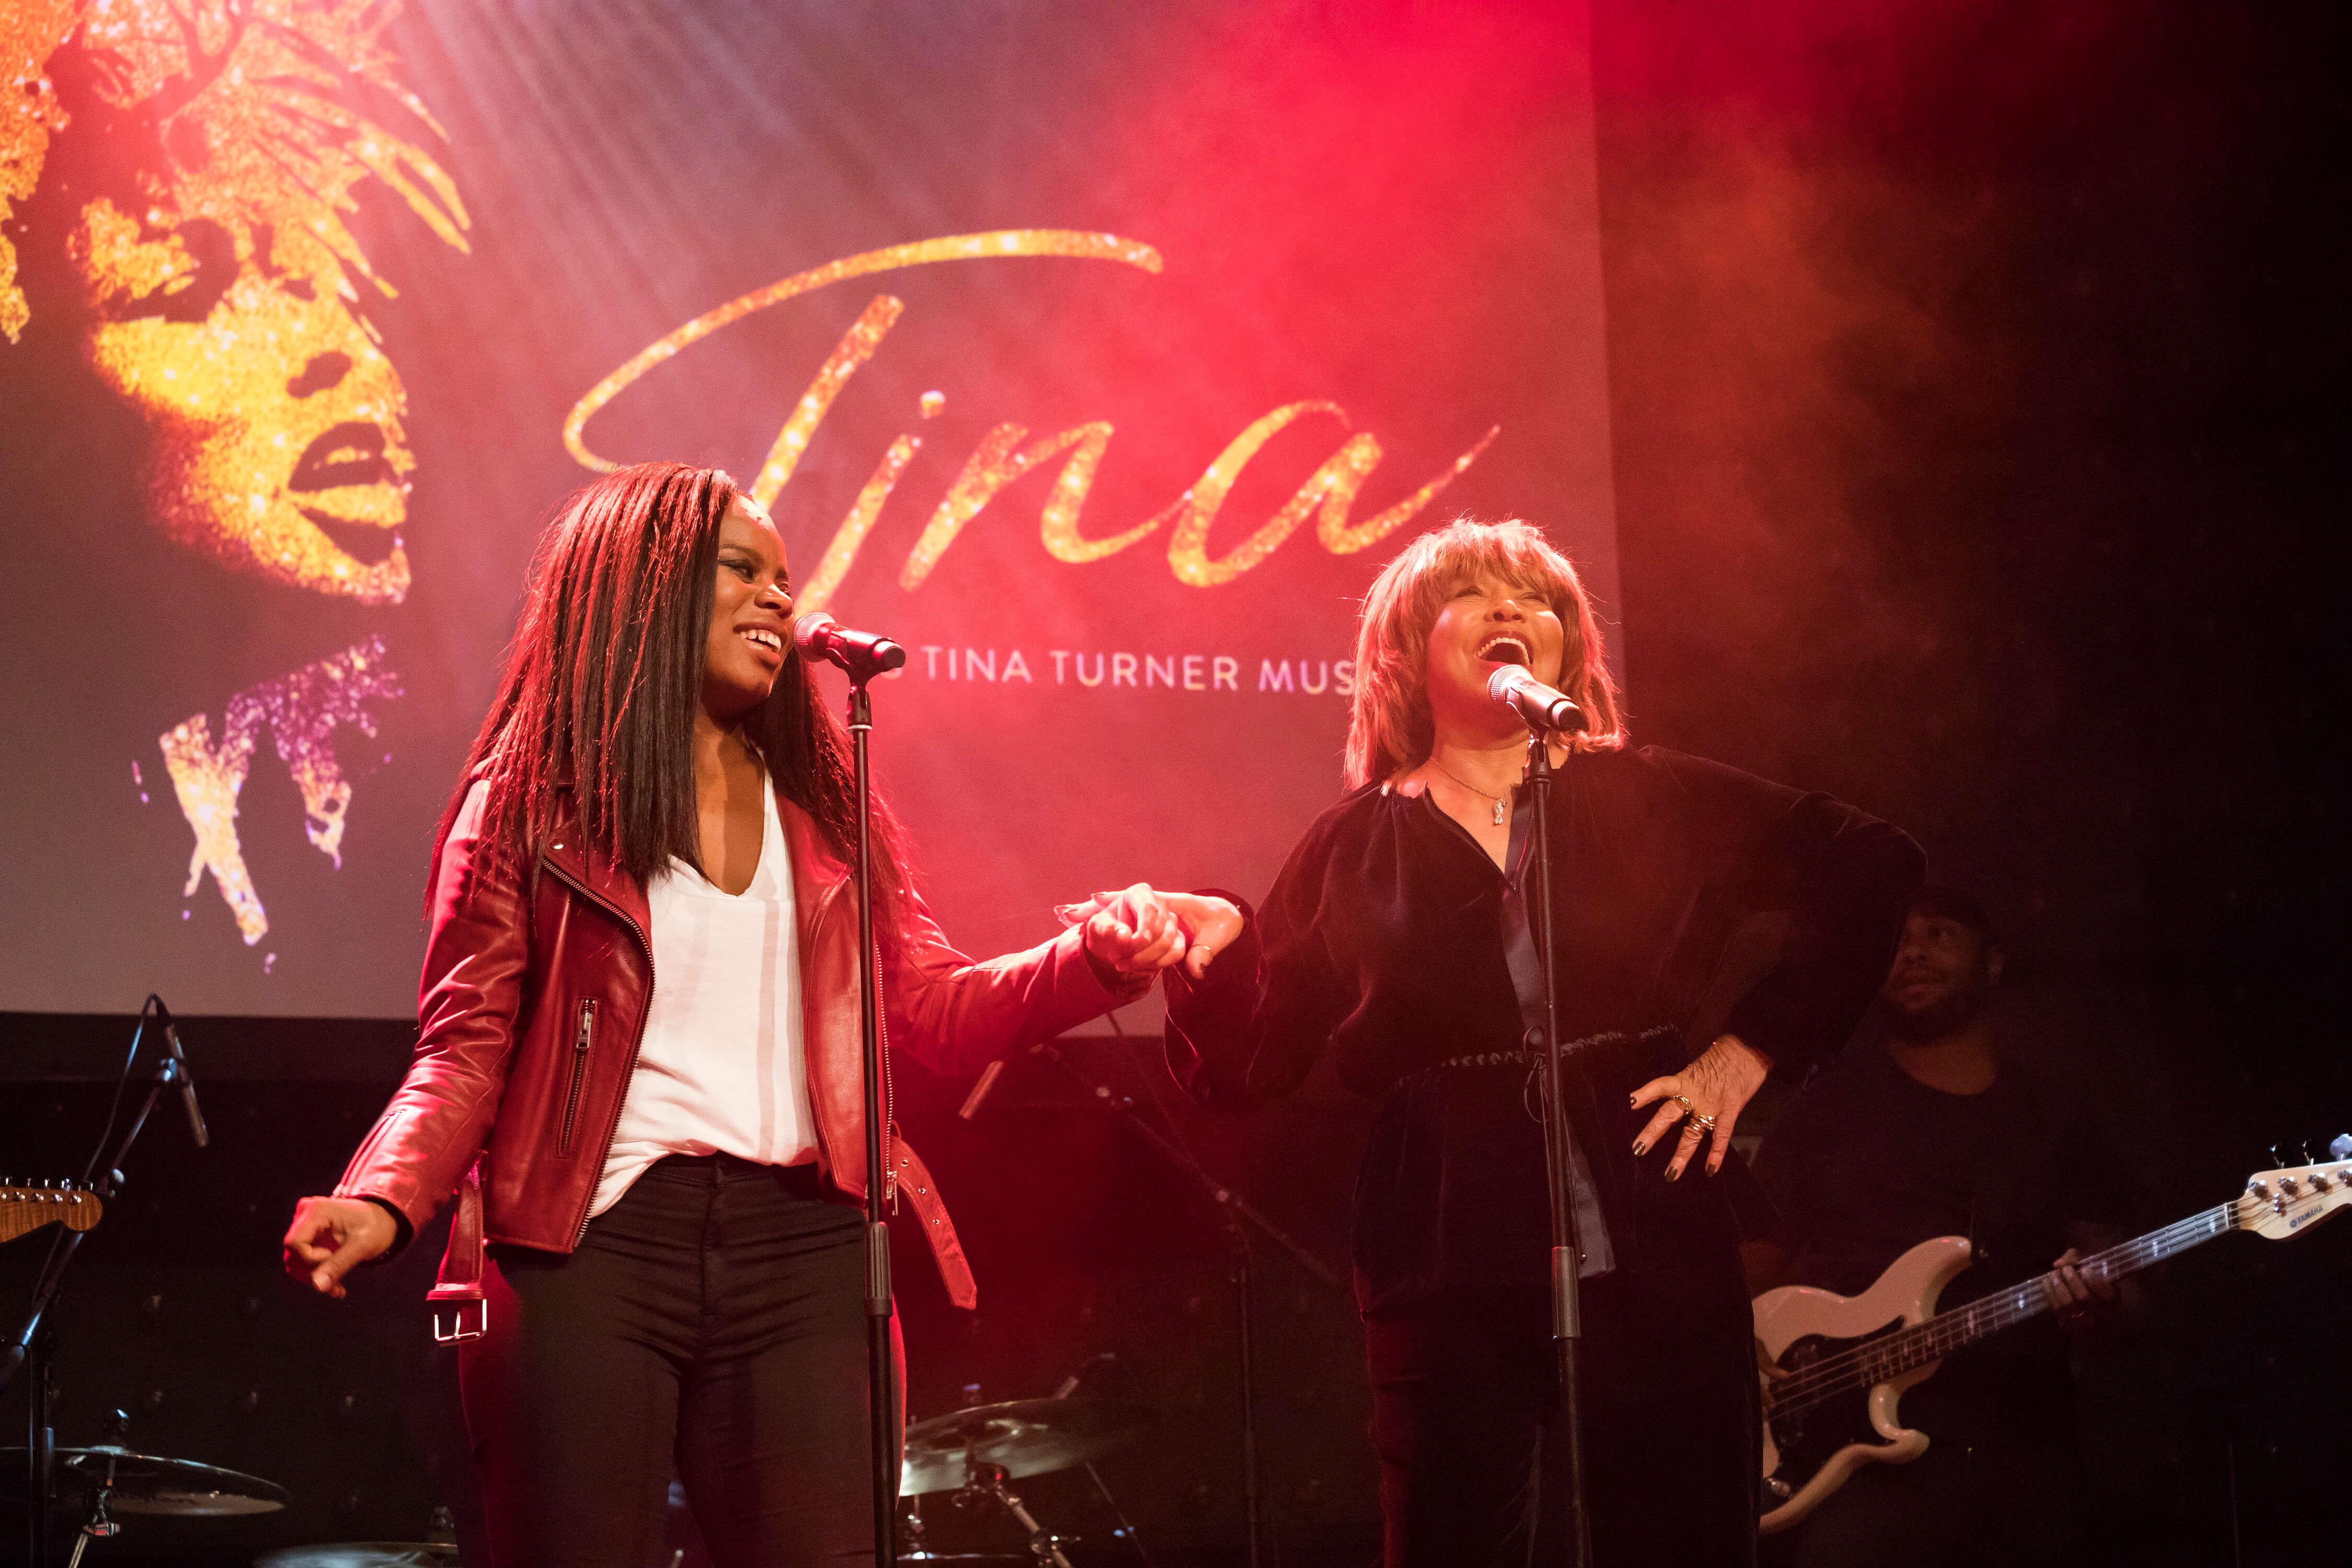 Tina Turner und Kristina Love beim Presse-Event am 23.10.2018.